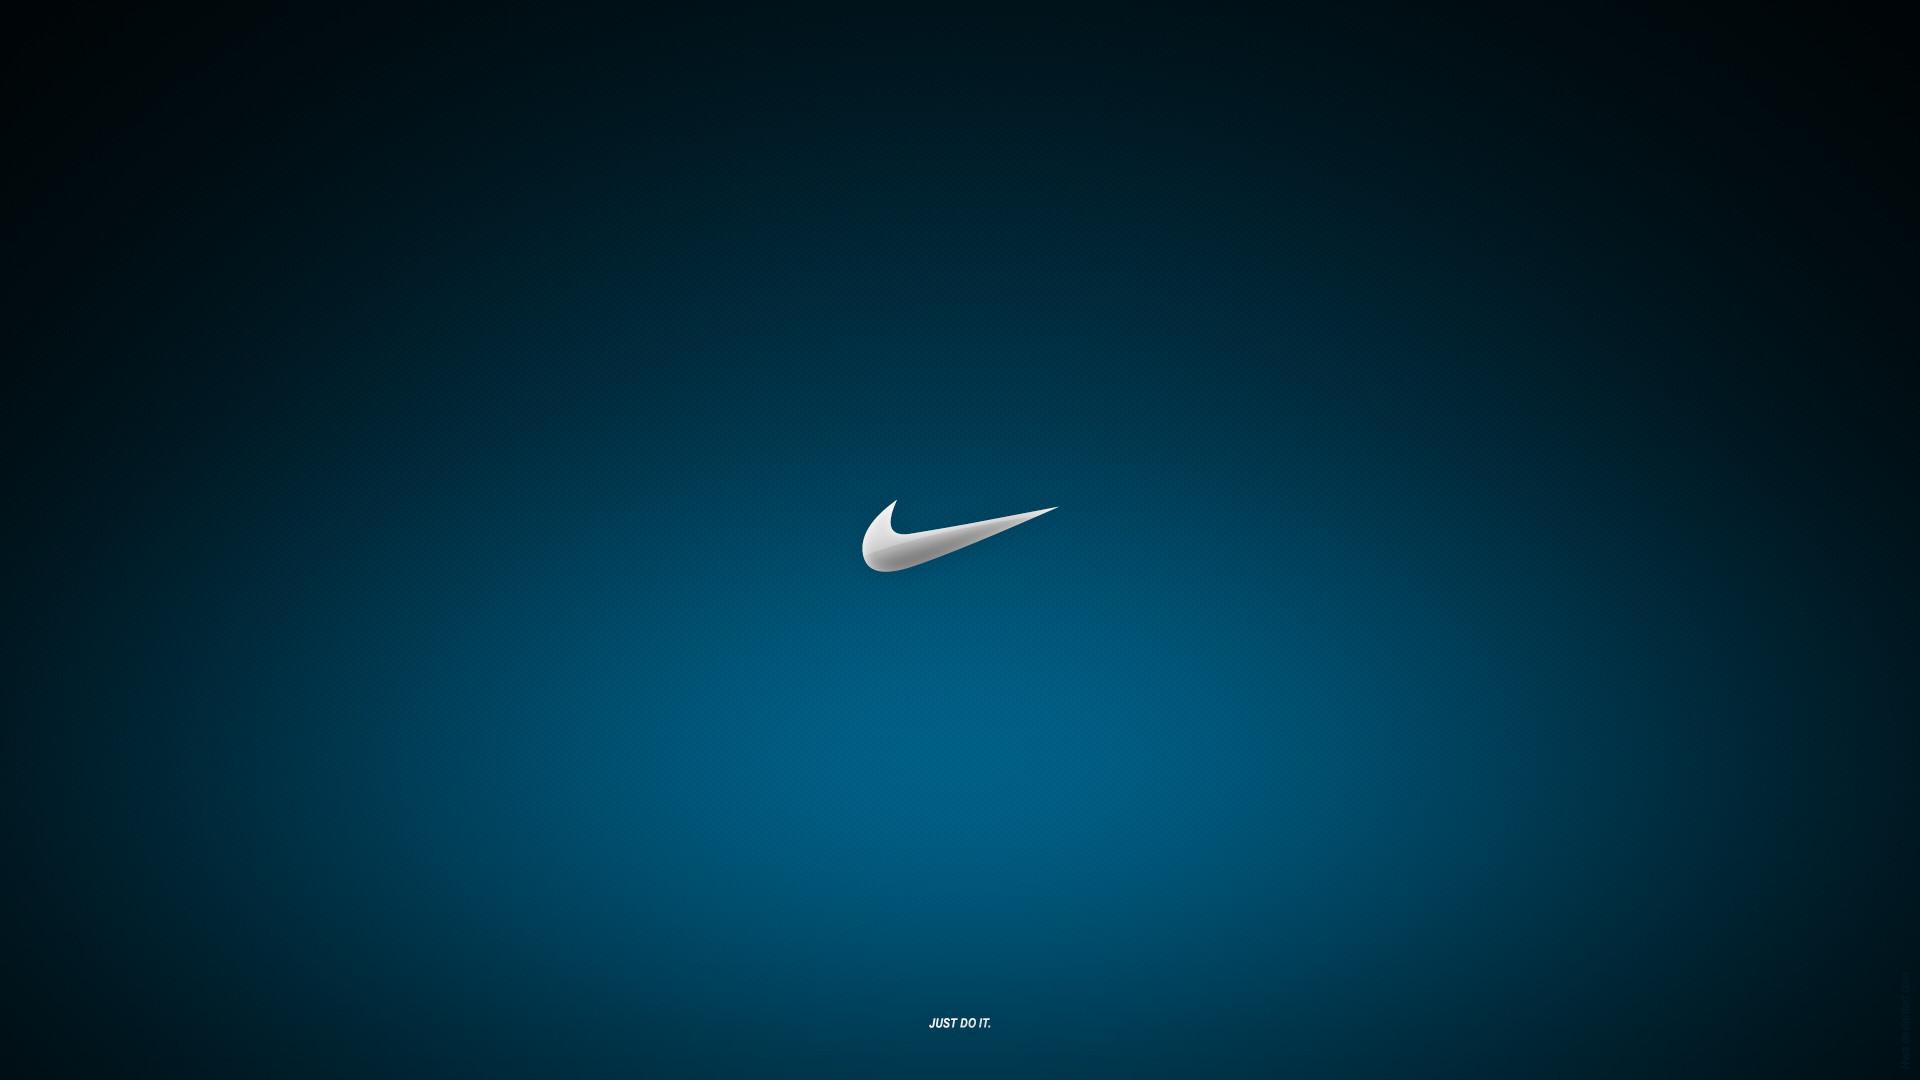 Nike Wallpaper HD 1080p   ImageBank.biz